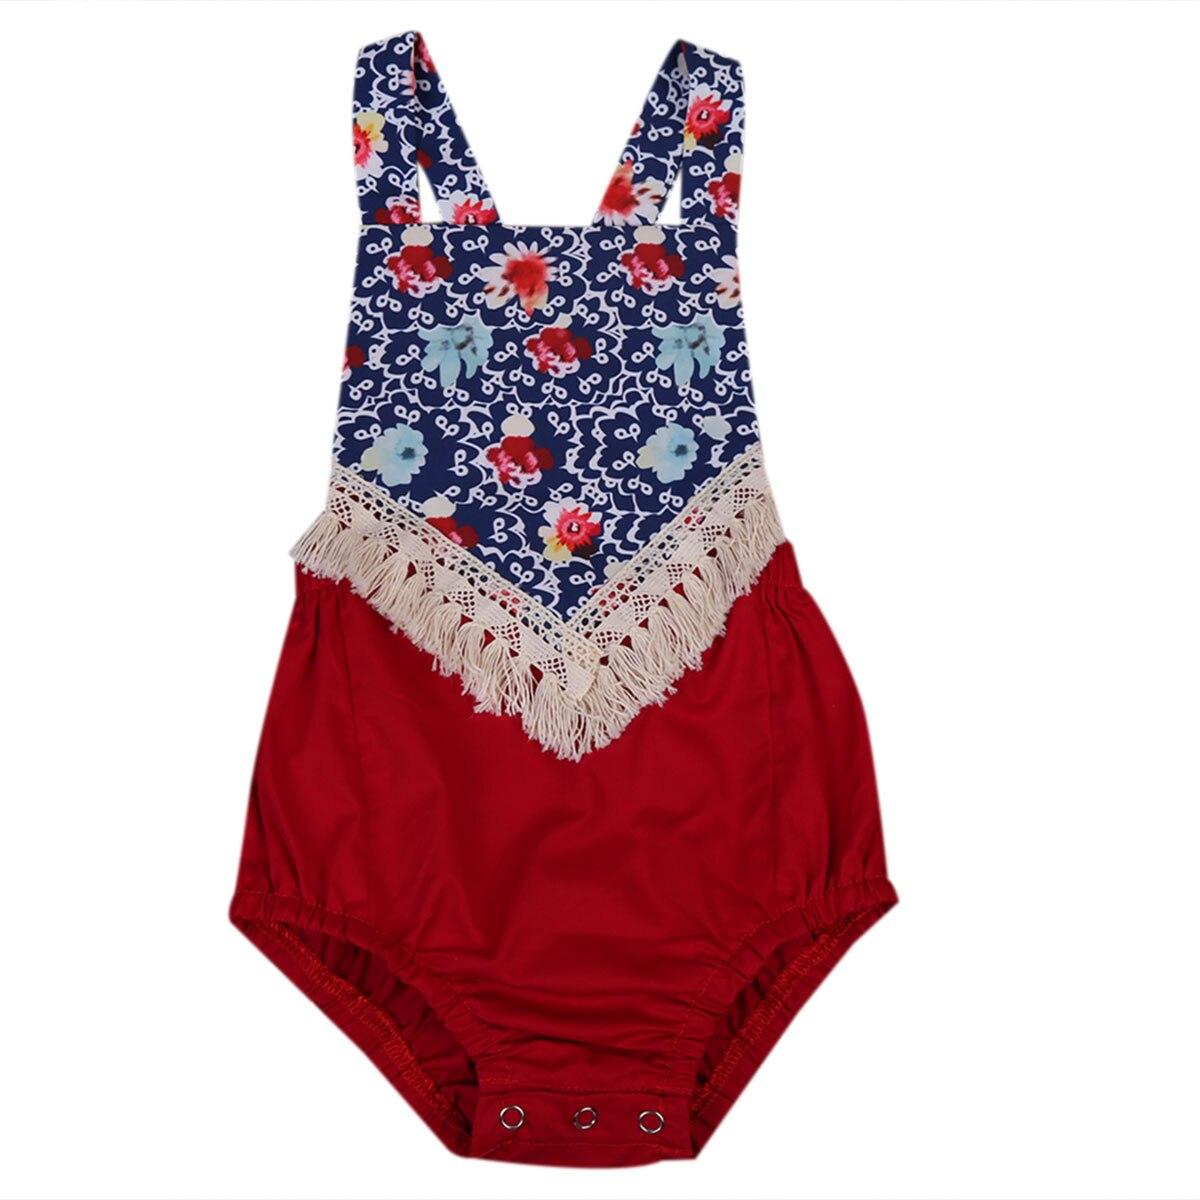 Mother & Kids 2017 Blue Fancy Newborn Infant Baby Girl Floral Romper Jumpsuit Outfits Sunsuit Clothes